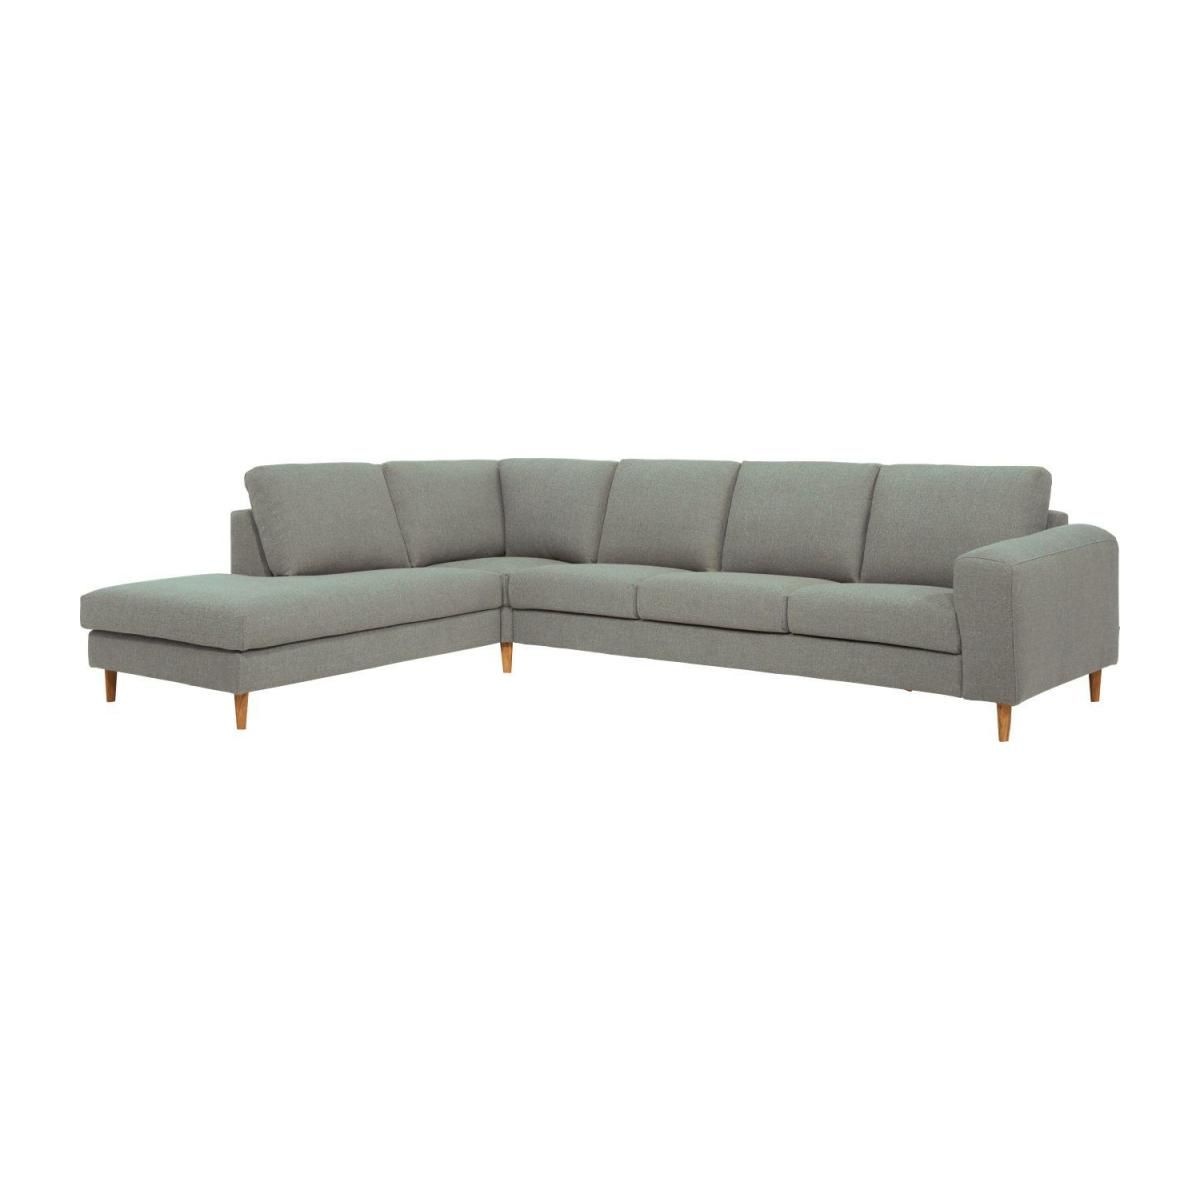 Bosa - 4-Sitzer-Sofa mit Open-End links aus Stoff, grau ...